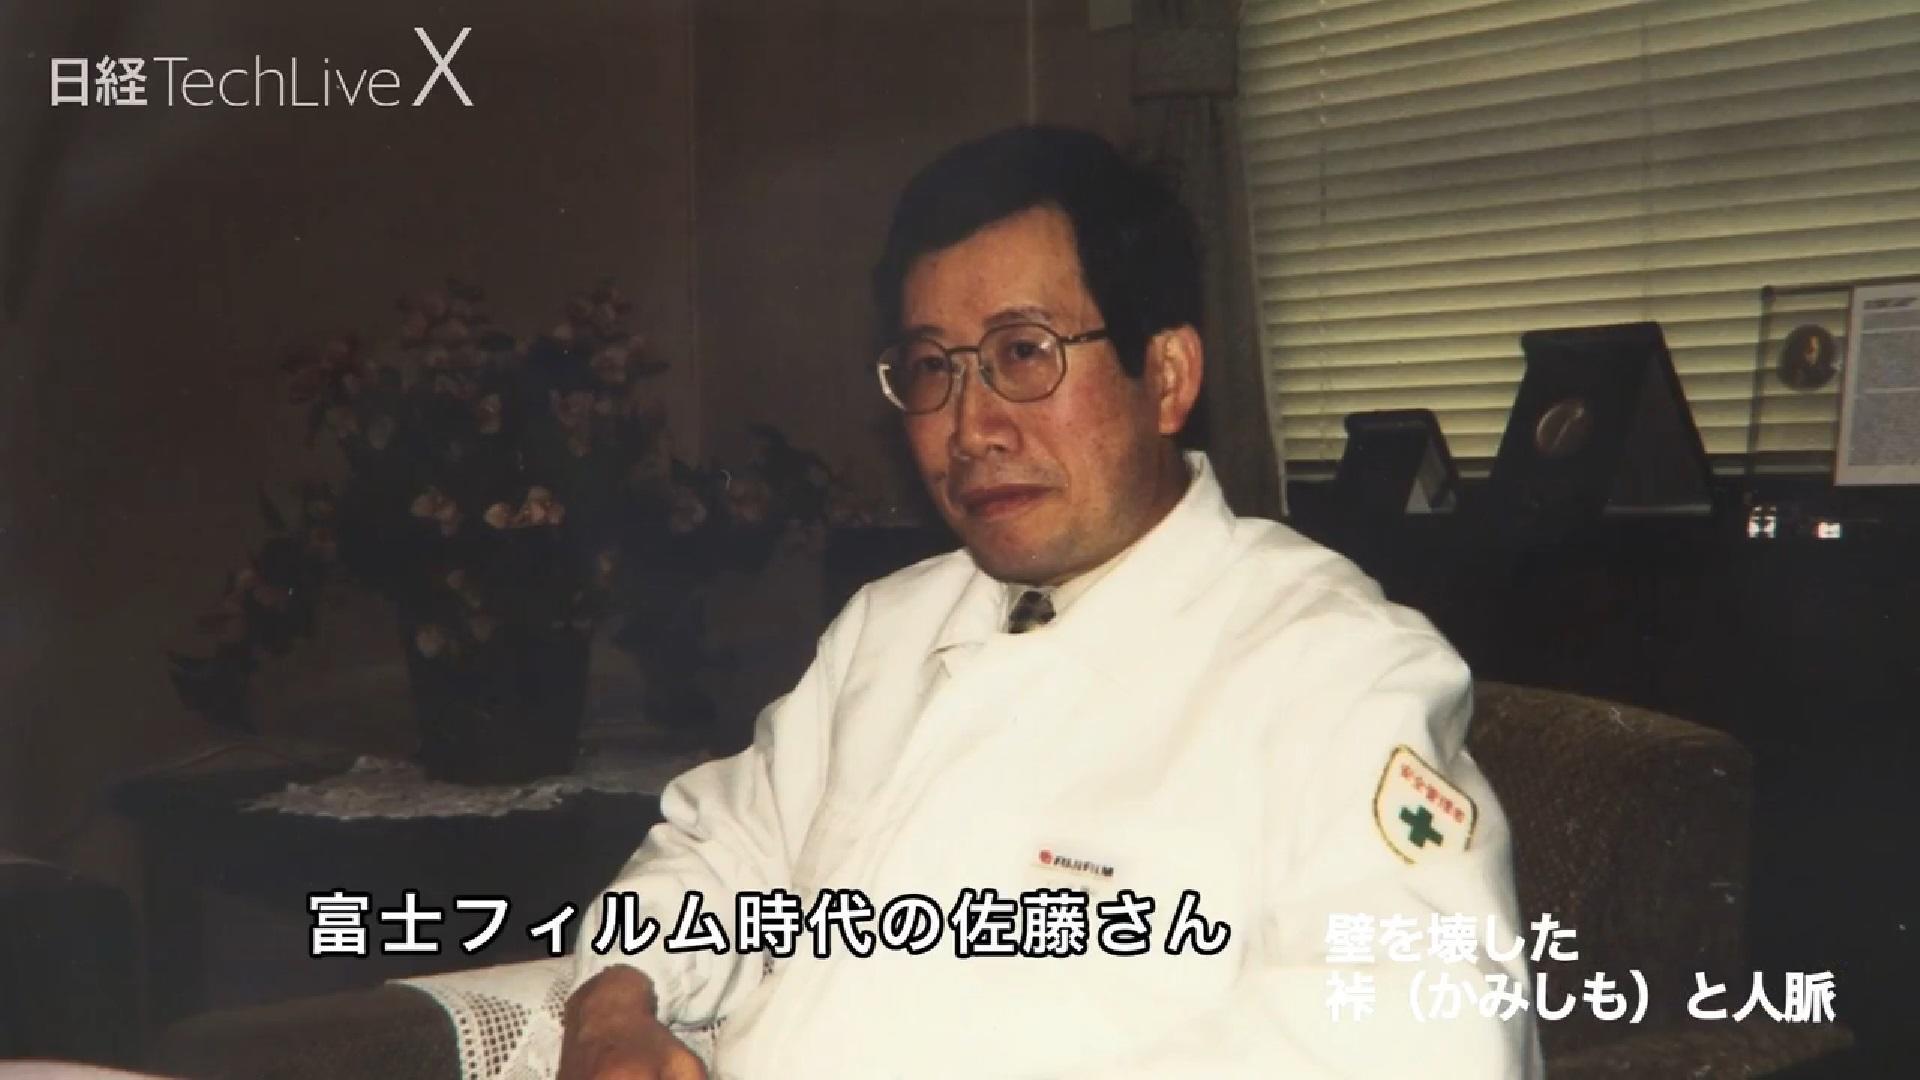 20181003_nikkeitlx_09.jpg